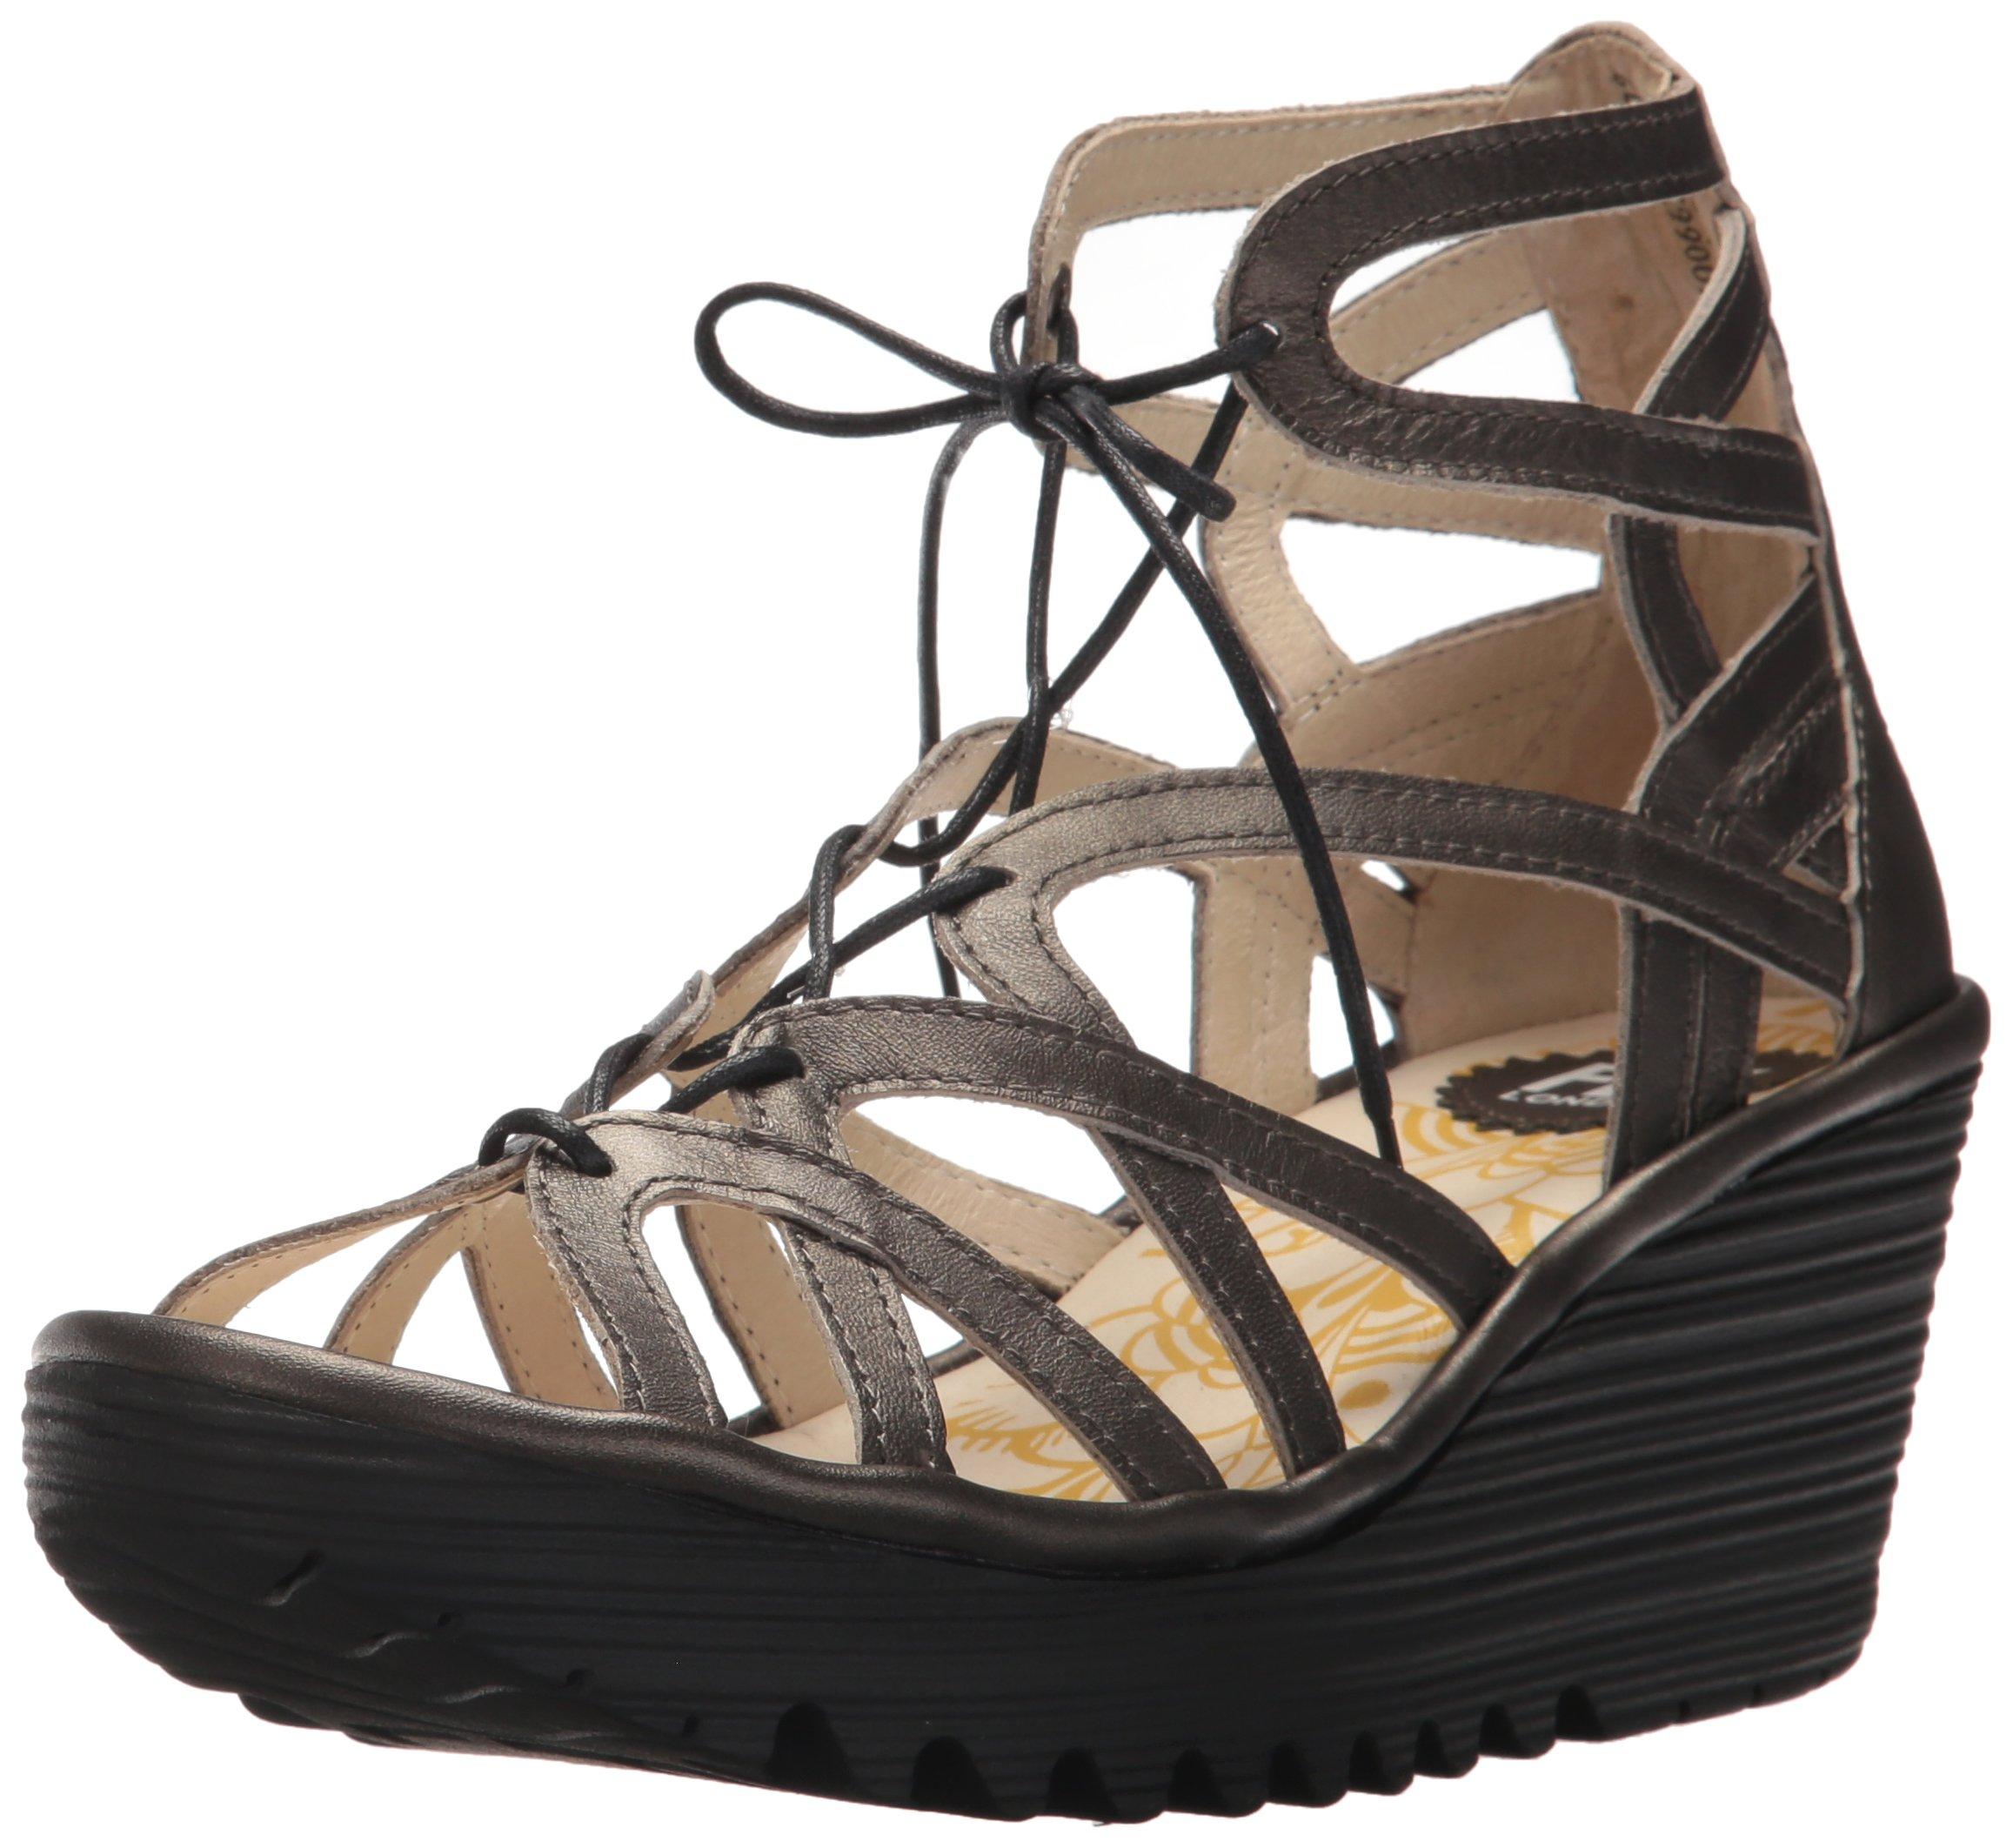 FLY London Women's YUKE663FLY Wedge Sandal, Anthracite Grace, 39 M EU (8-8.5 US)